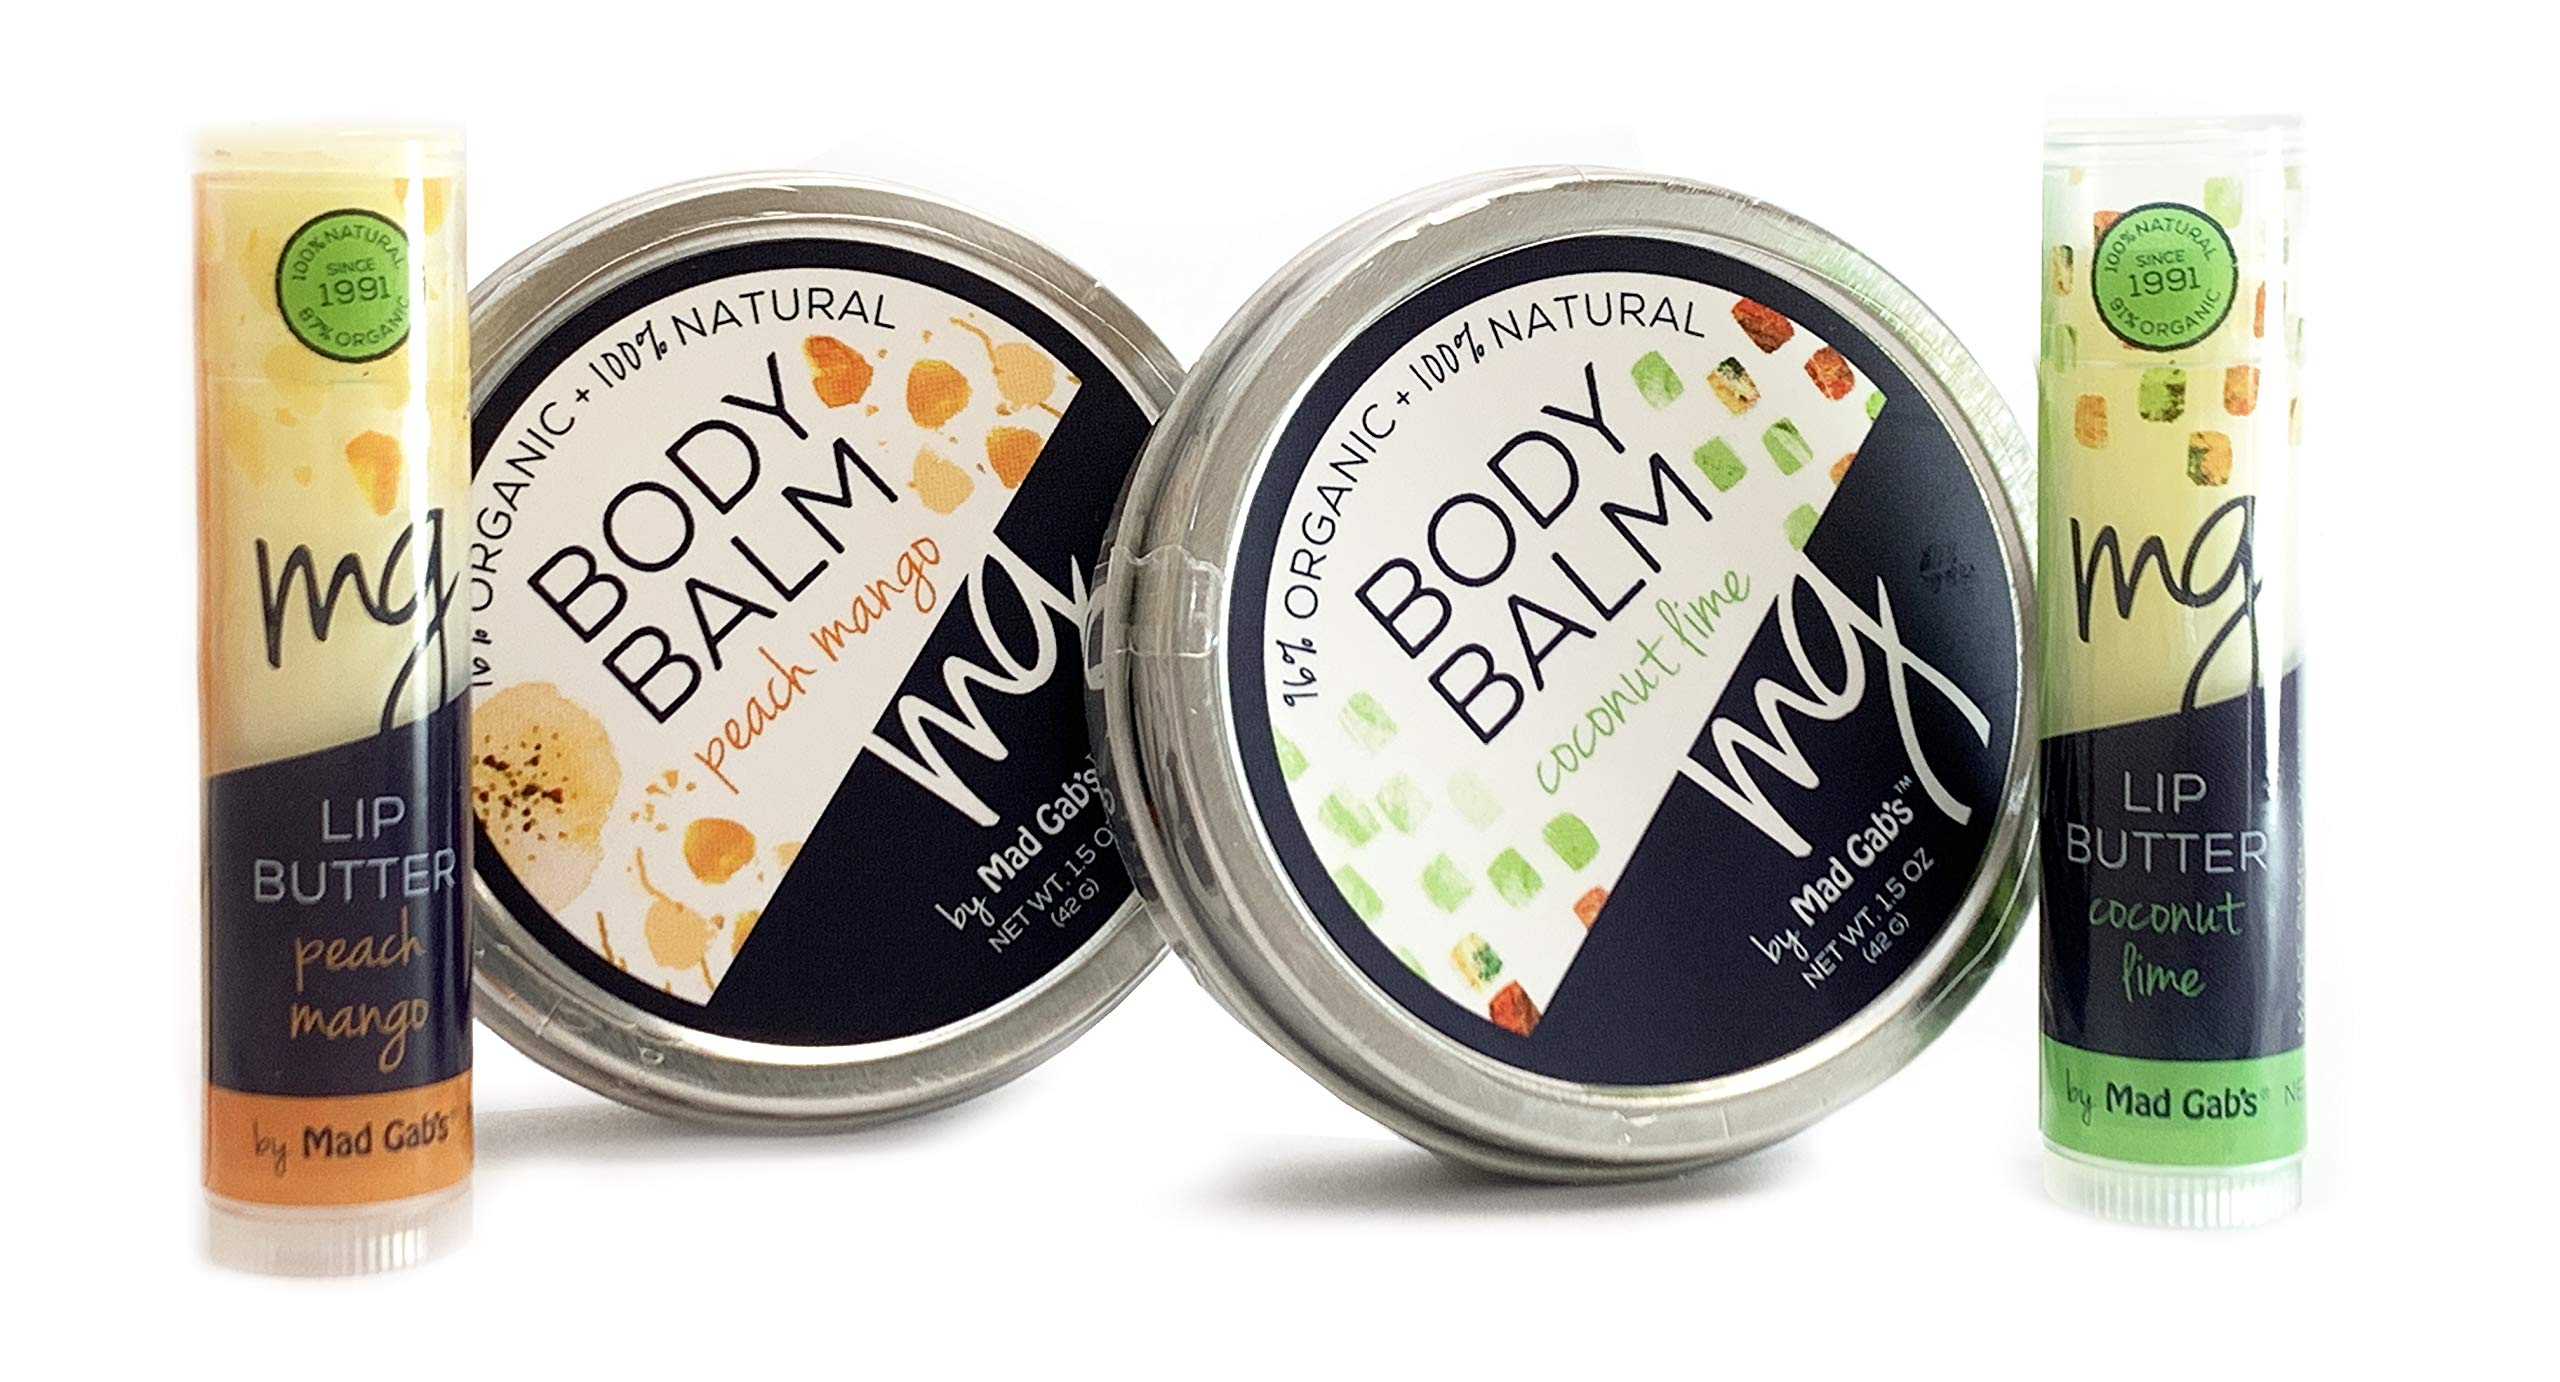 Mad Gab's MG Signature 4-Piece Natural & Organic Coconut-Lime/Mango/Peach Balm & Lip Butter Sticks Gift Set by Mad Gab's